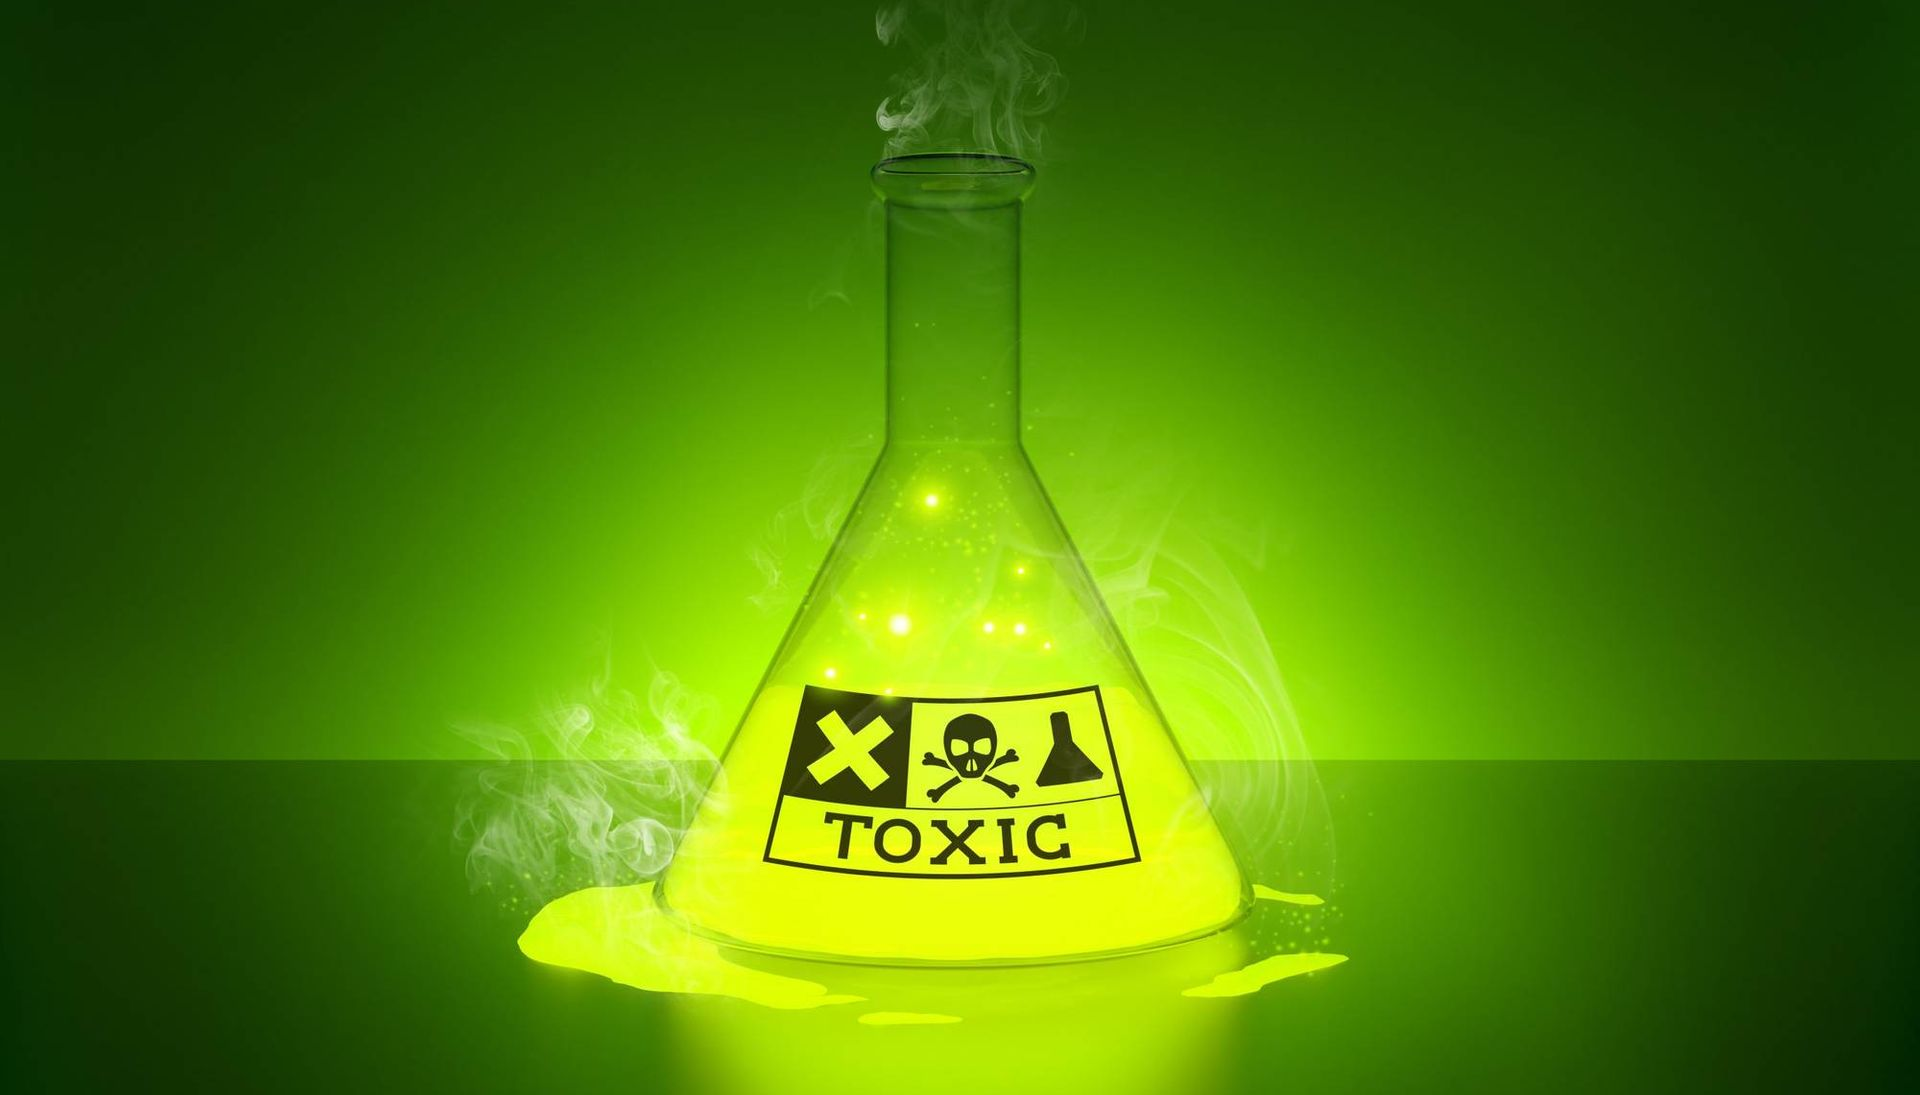 Toxic symbol on green-glowing beaker. Rewire PBS Love Toxic Positivity